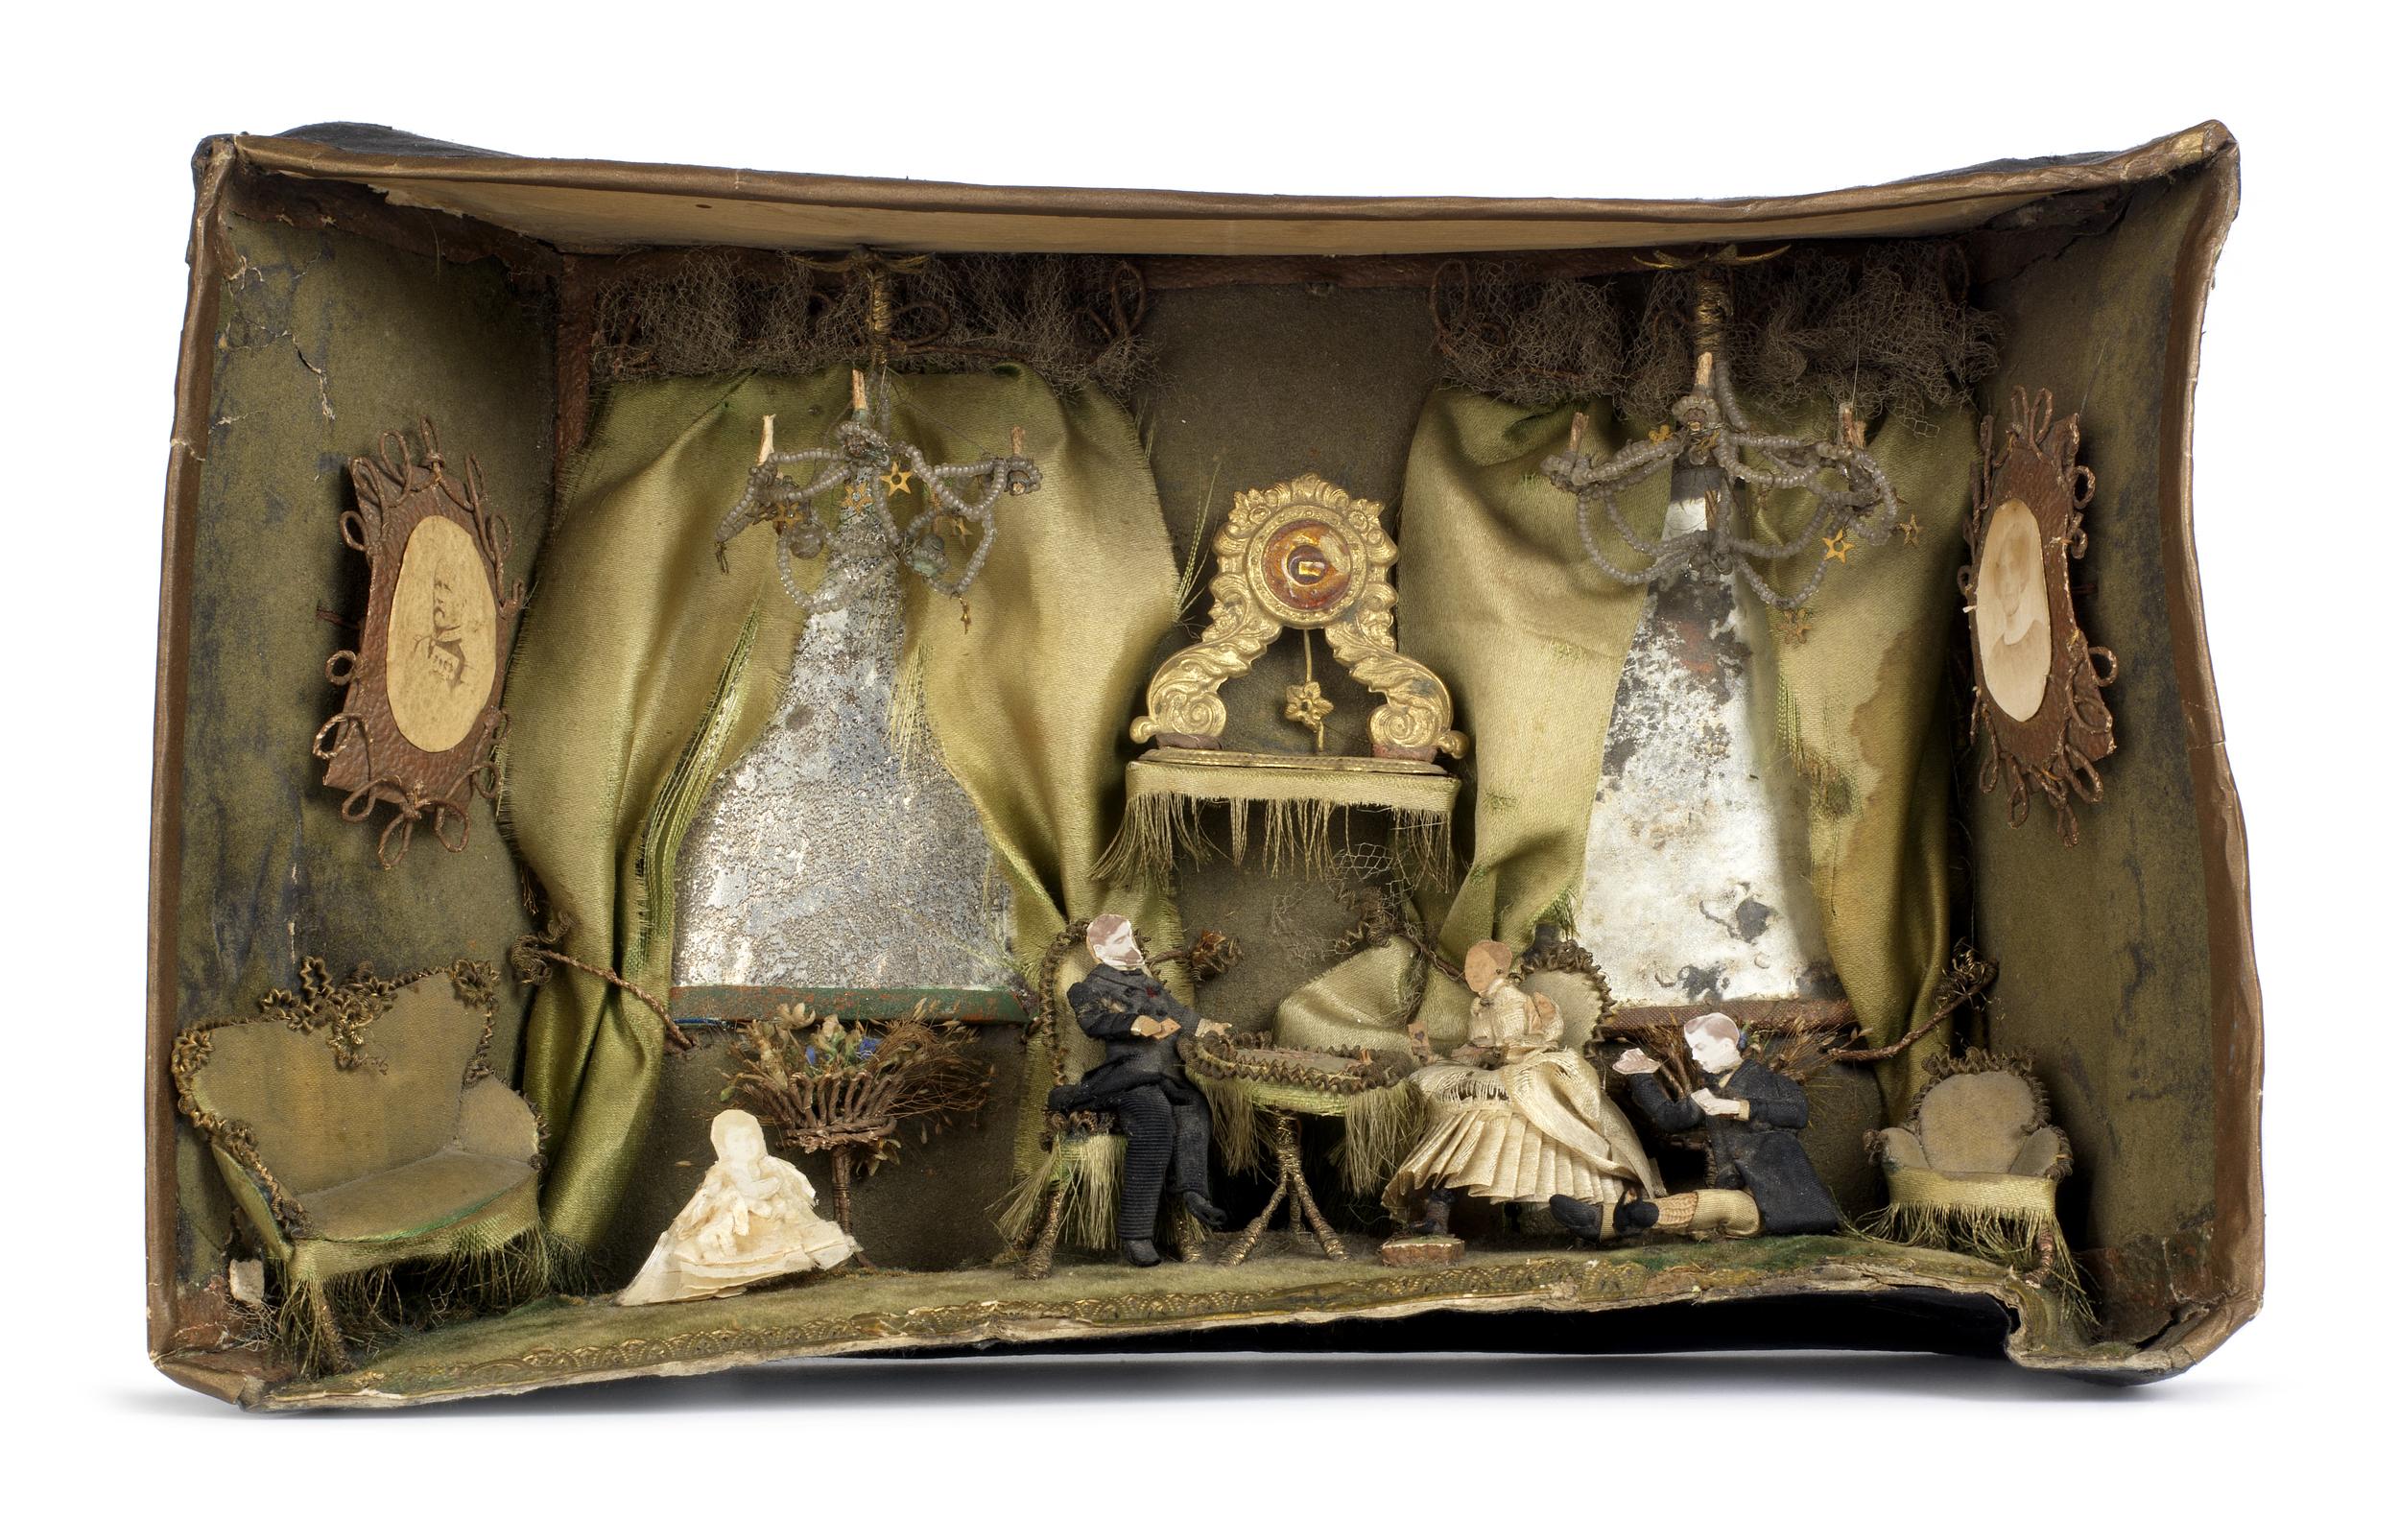 Edwardian Diorama